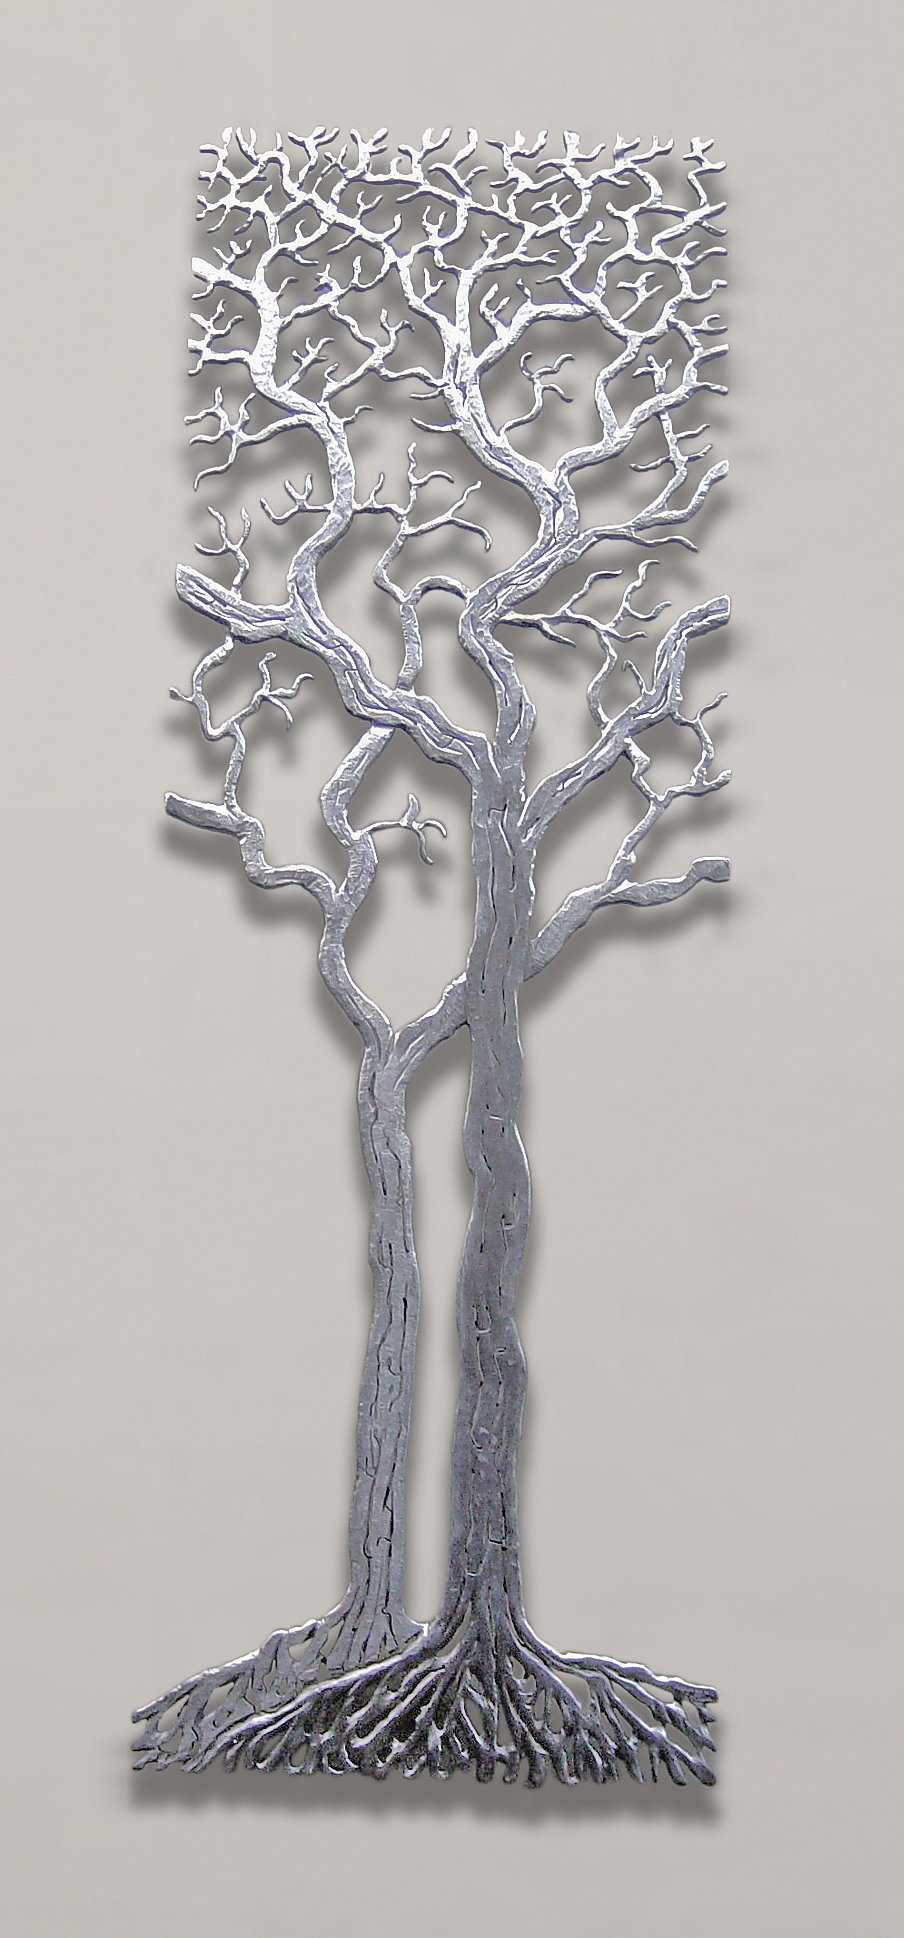 Metal tree sculpture wall decor : Centuries tree by bernard collin metal wall art artful